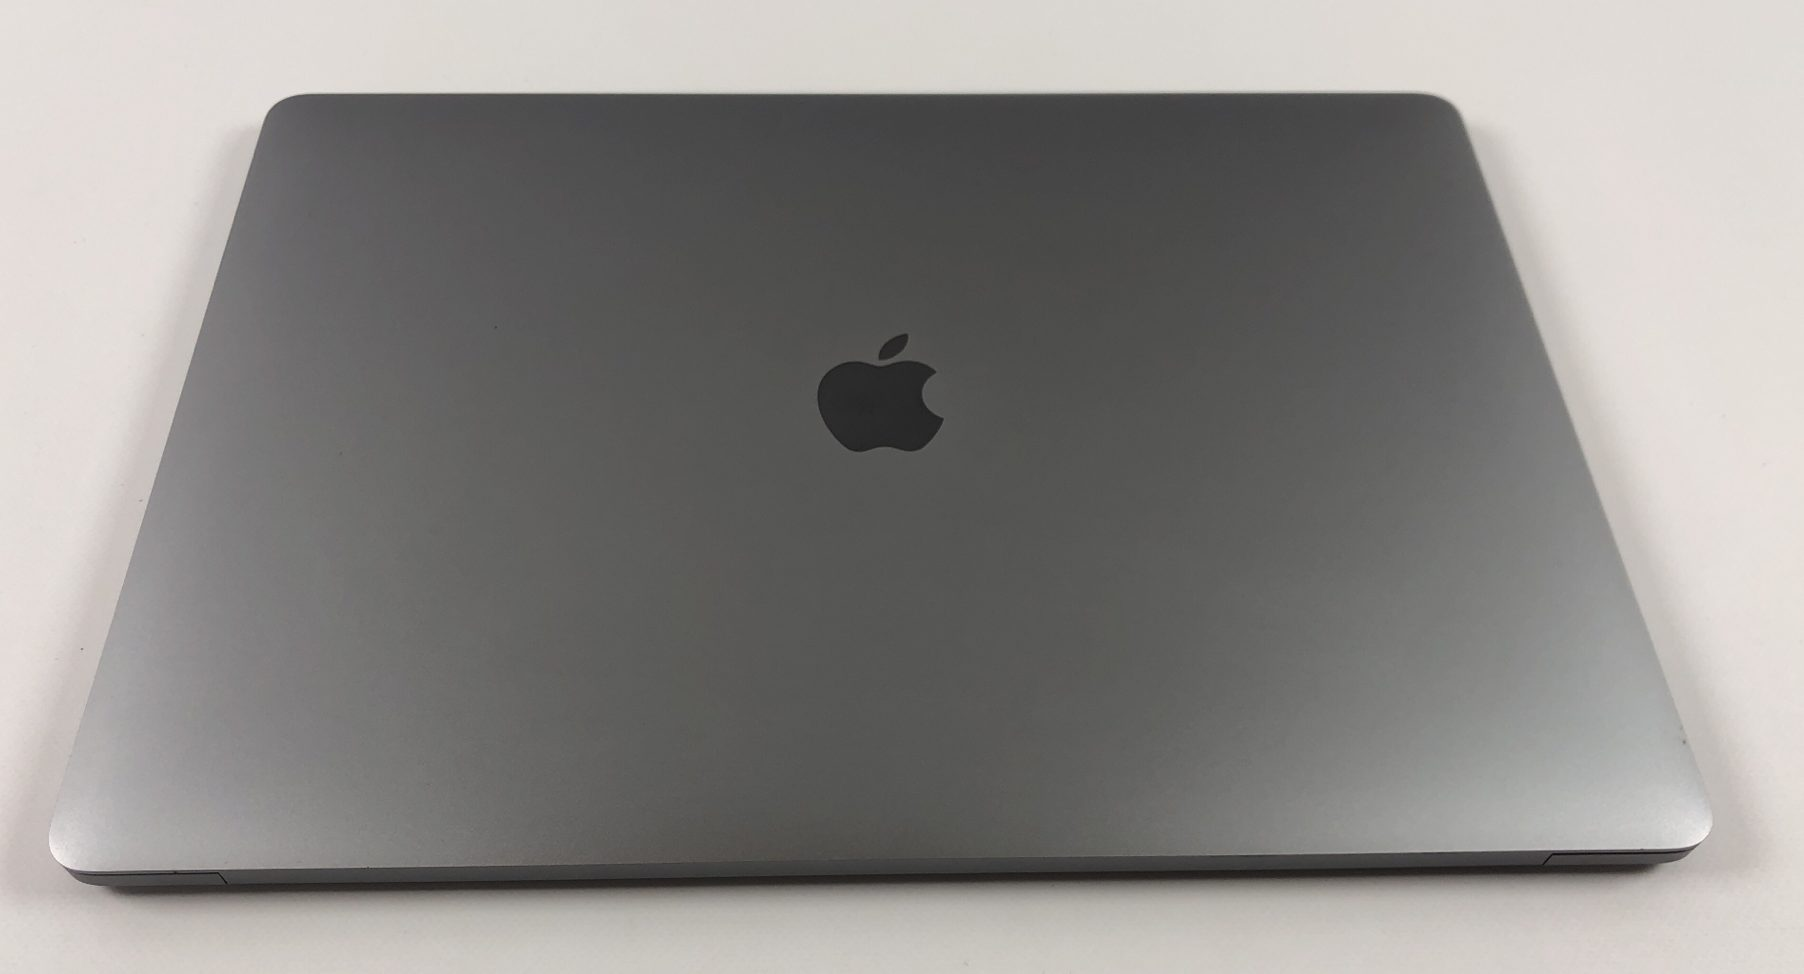 "MacBook Pro 15"" Touch Bar Late 2016 (Intel Quad-Core i7 2.9 GHz 16 GB RAM 2 TB SSD), Space Gray, Intel Quad-Core i7 2.9 GHz, 16 GB RAM, 2 TB SSD, image 3"